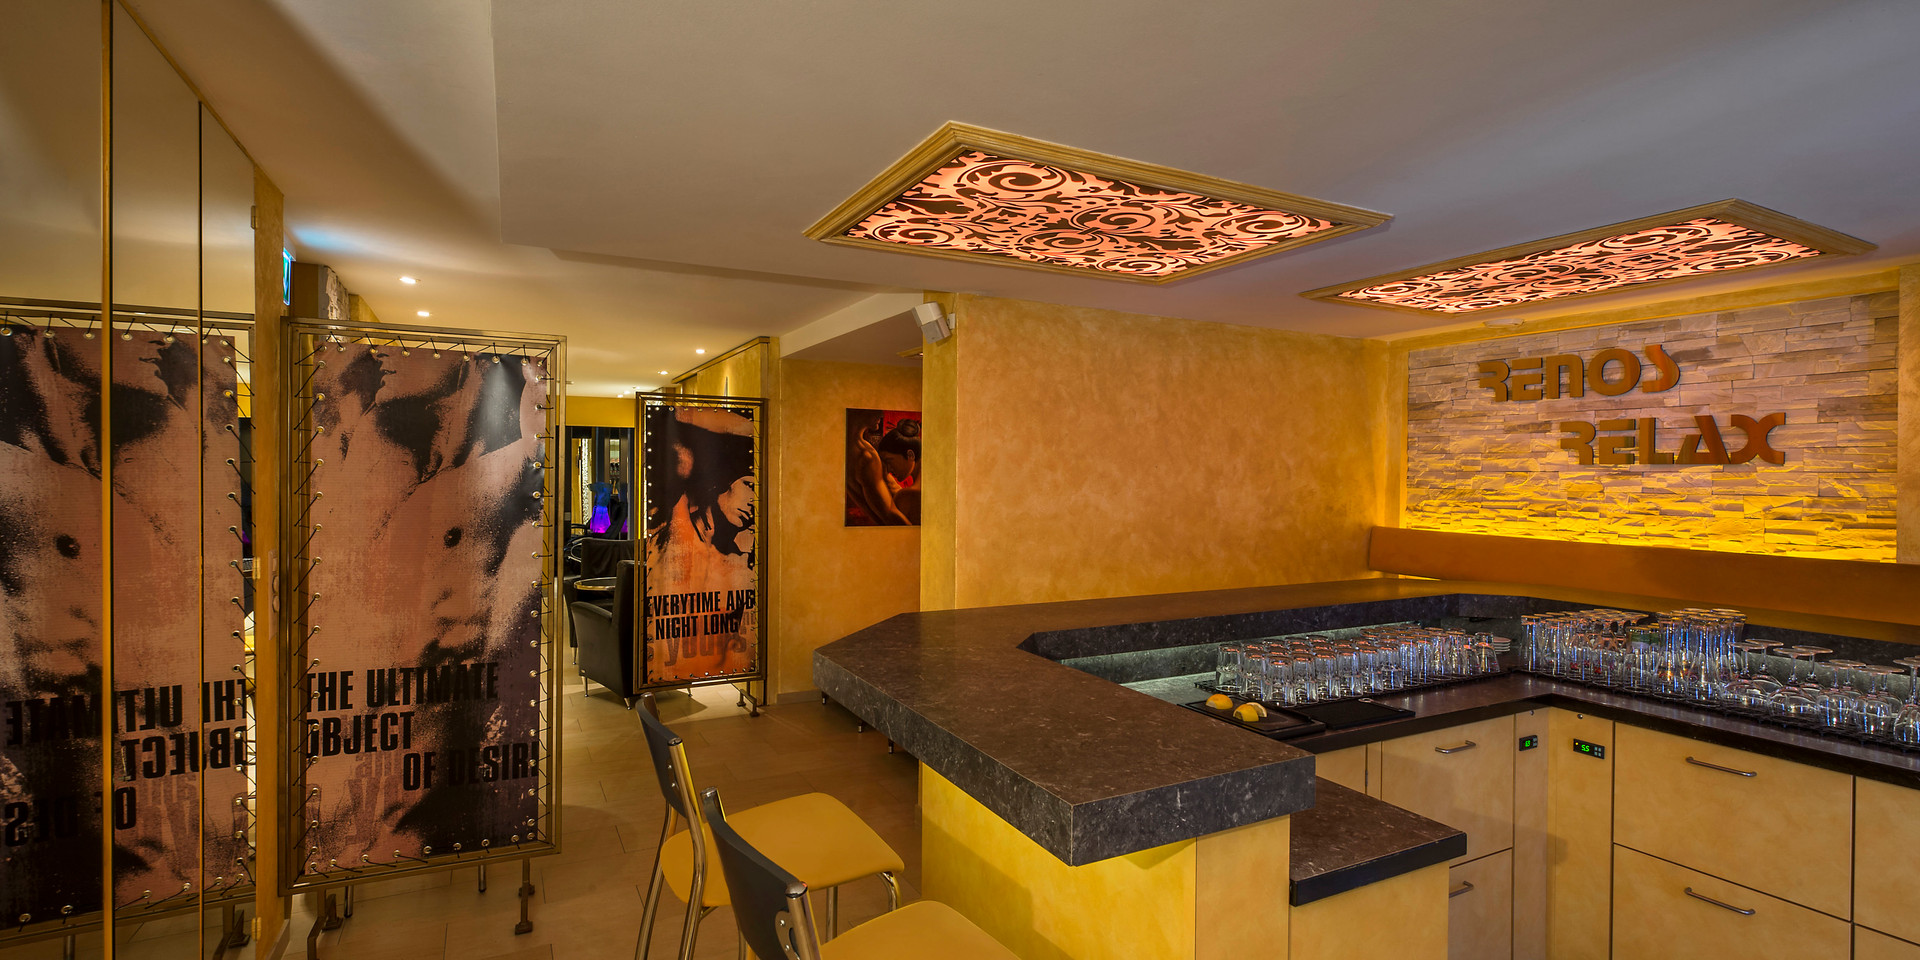 gay-sauna-renos-relax-club-bar